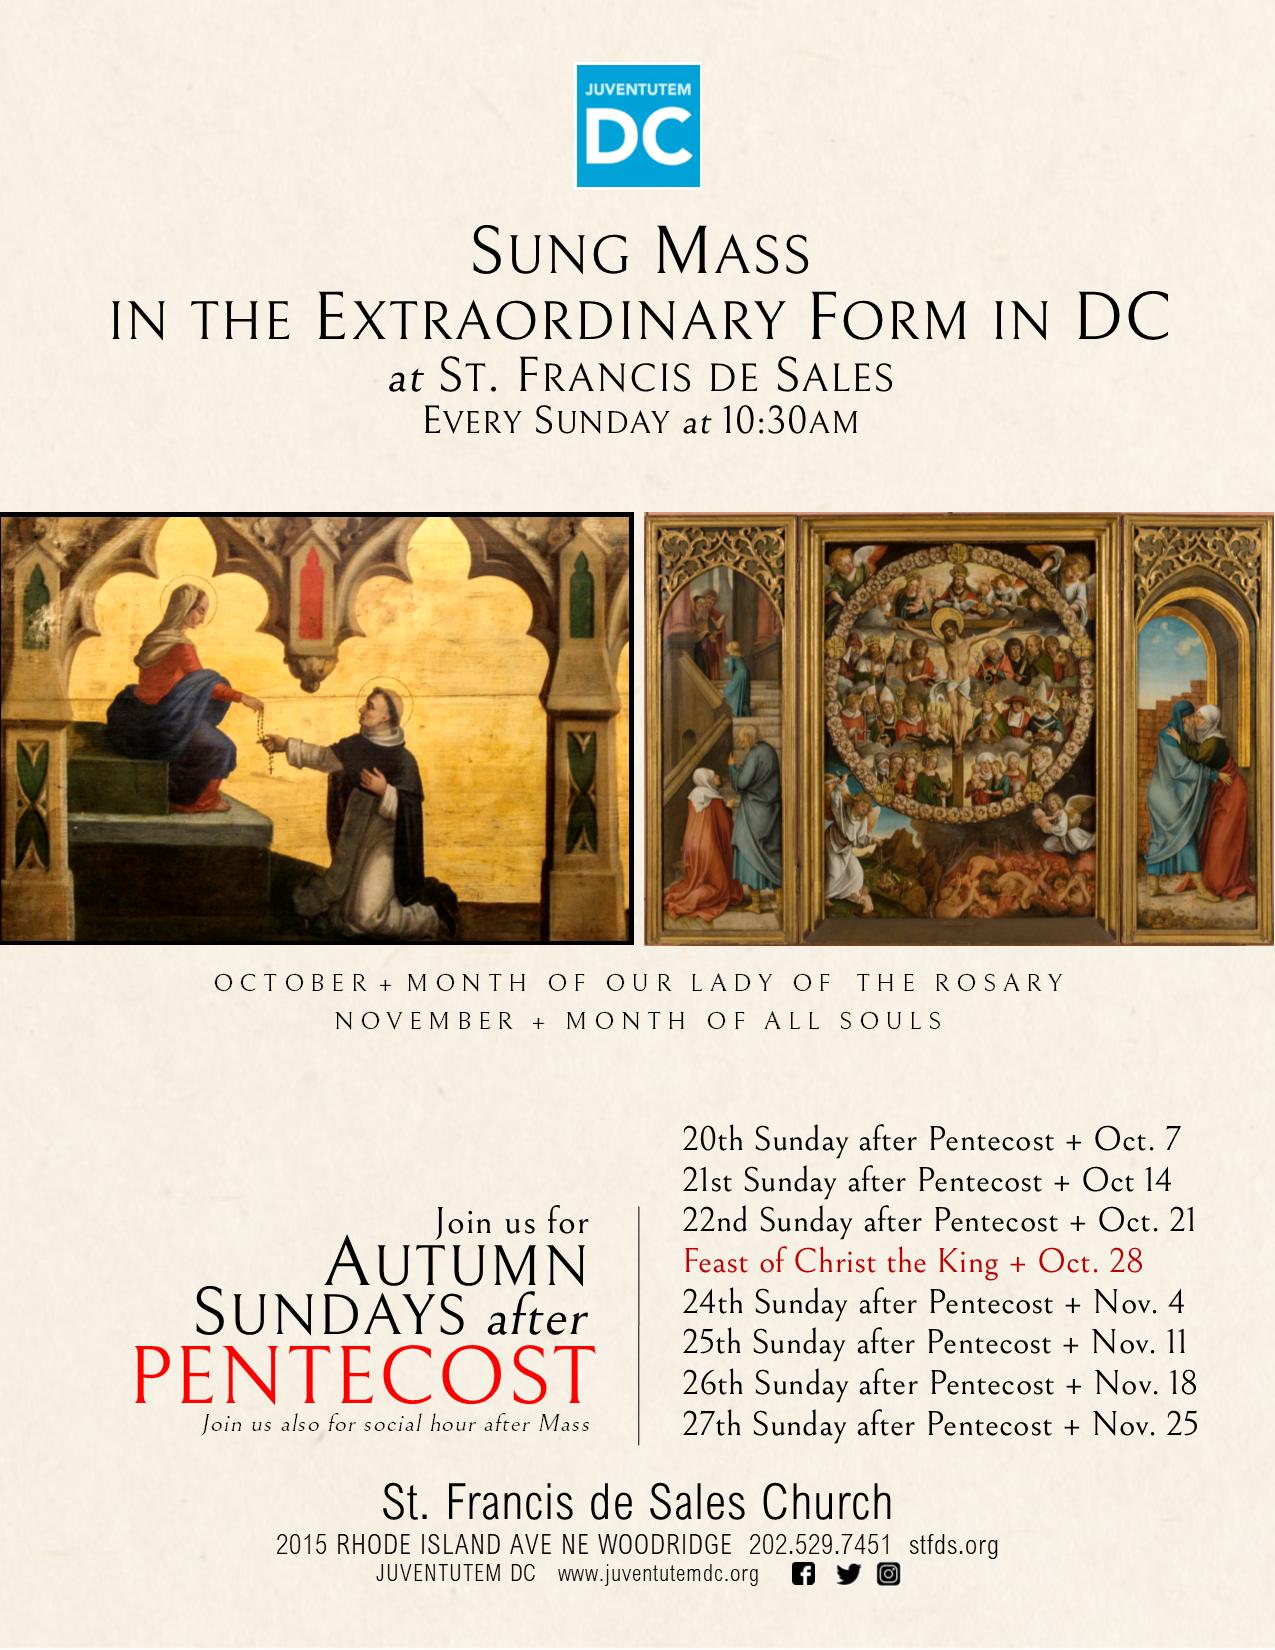 2018 09 Autumn Sundays after Pentecost v2 London.png